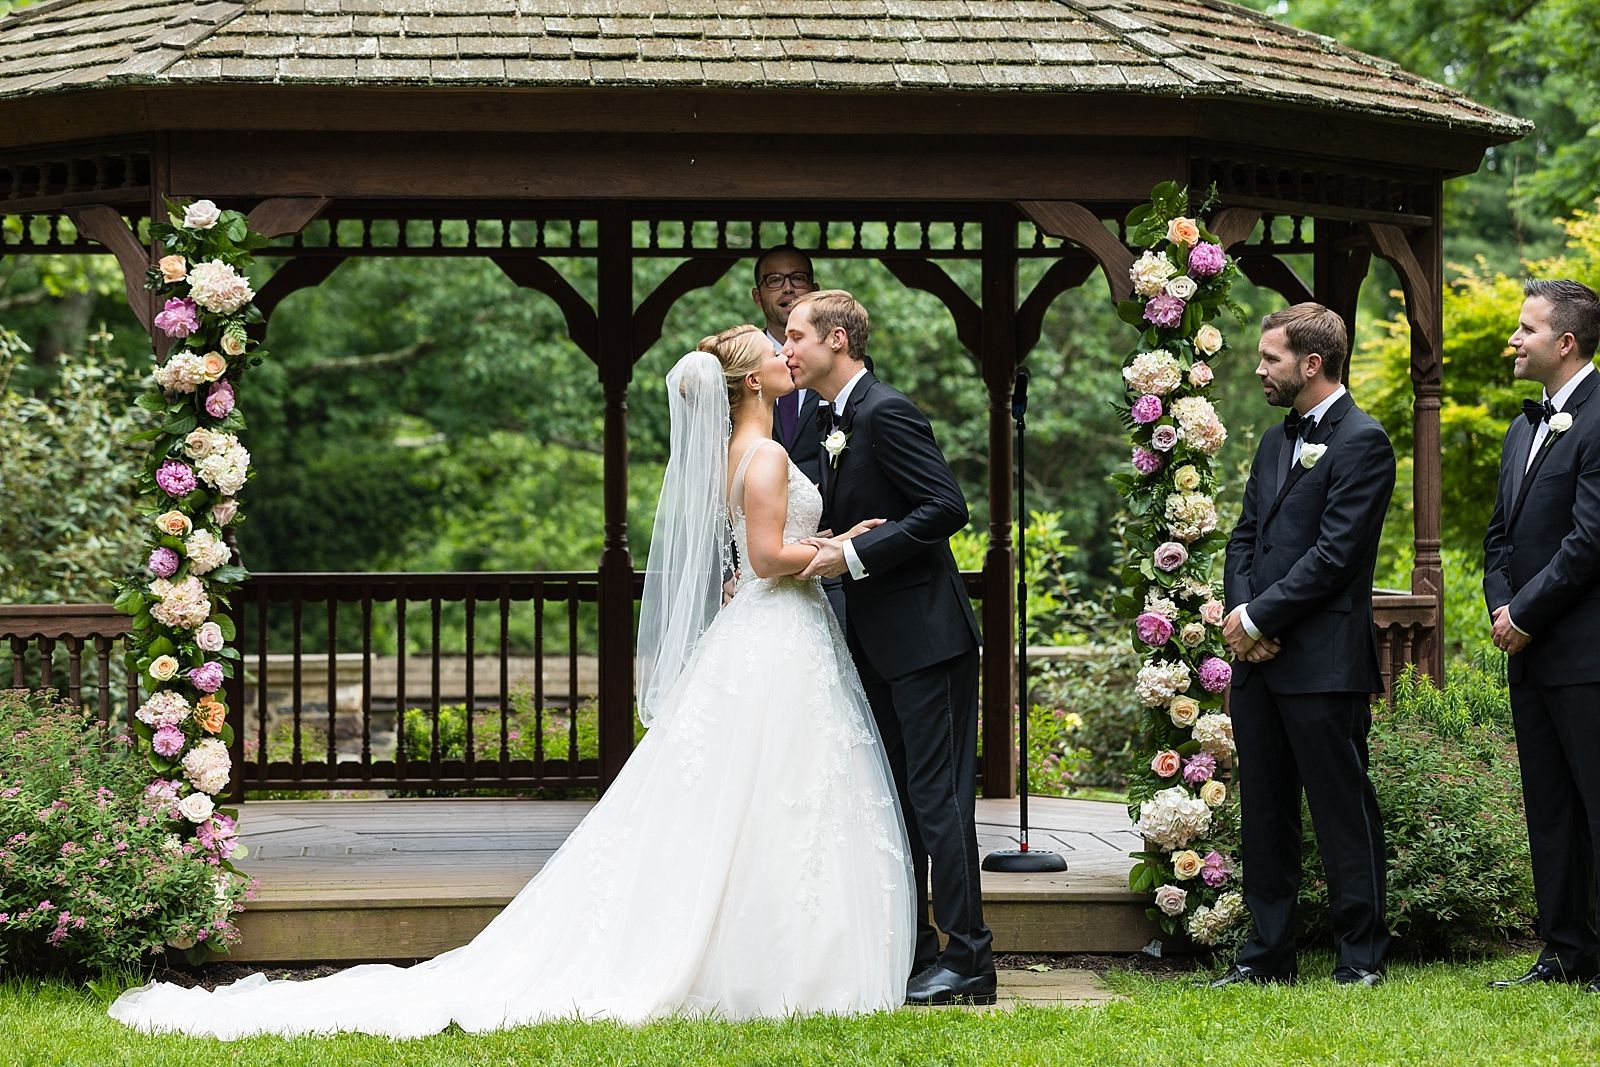 First Kiss Outdoor Ceremony Gazebo Ceremony Park Weddings Wedding Ceremony Photos Wedding Ceremony Backdrop